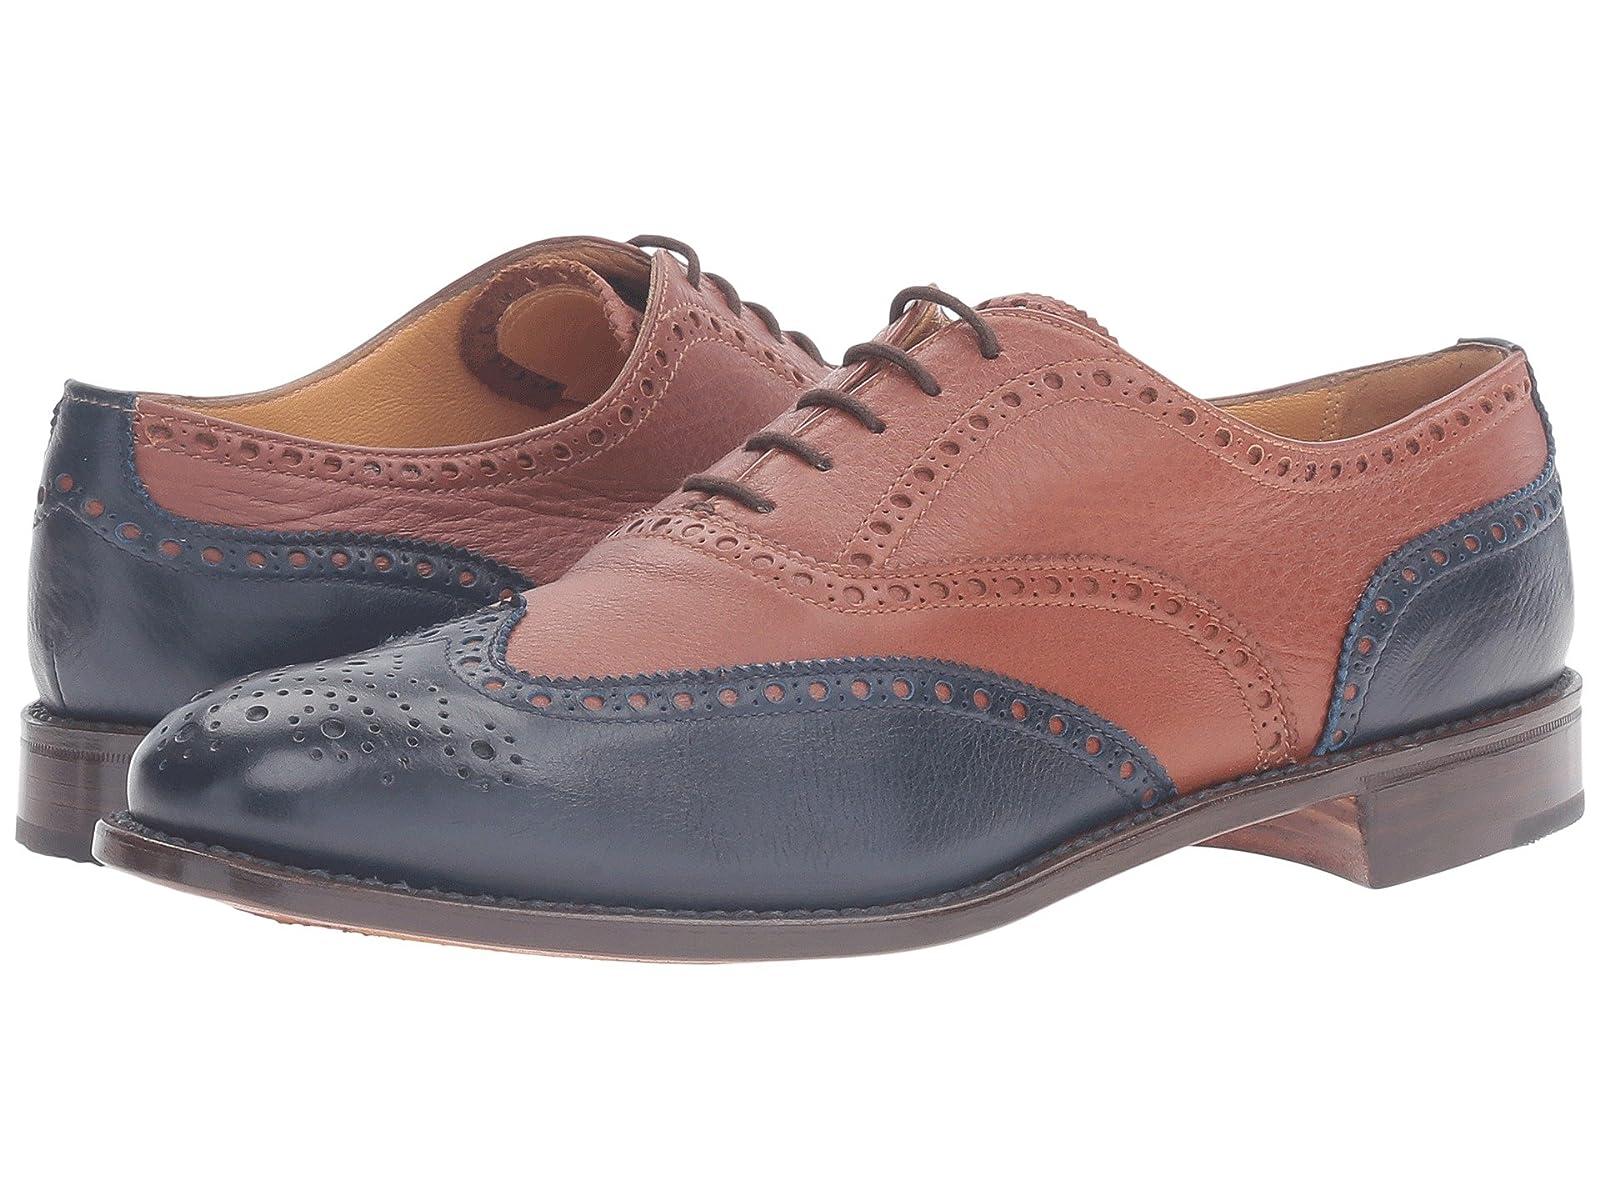 Gravati Calf Toe 5 Eyelet WingtipCheap and distinctive eye-catching shoes